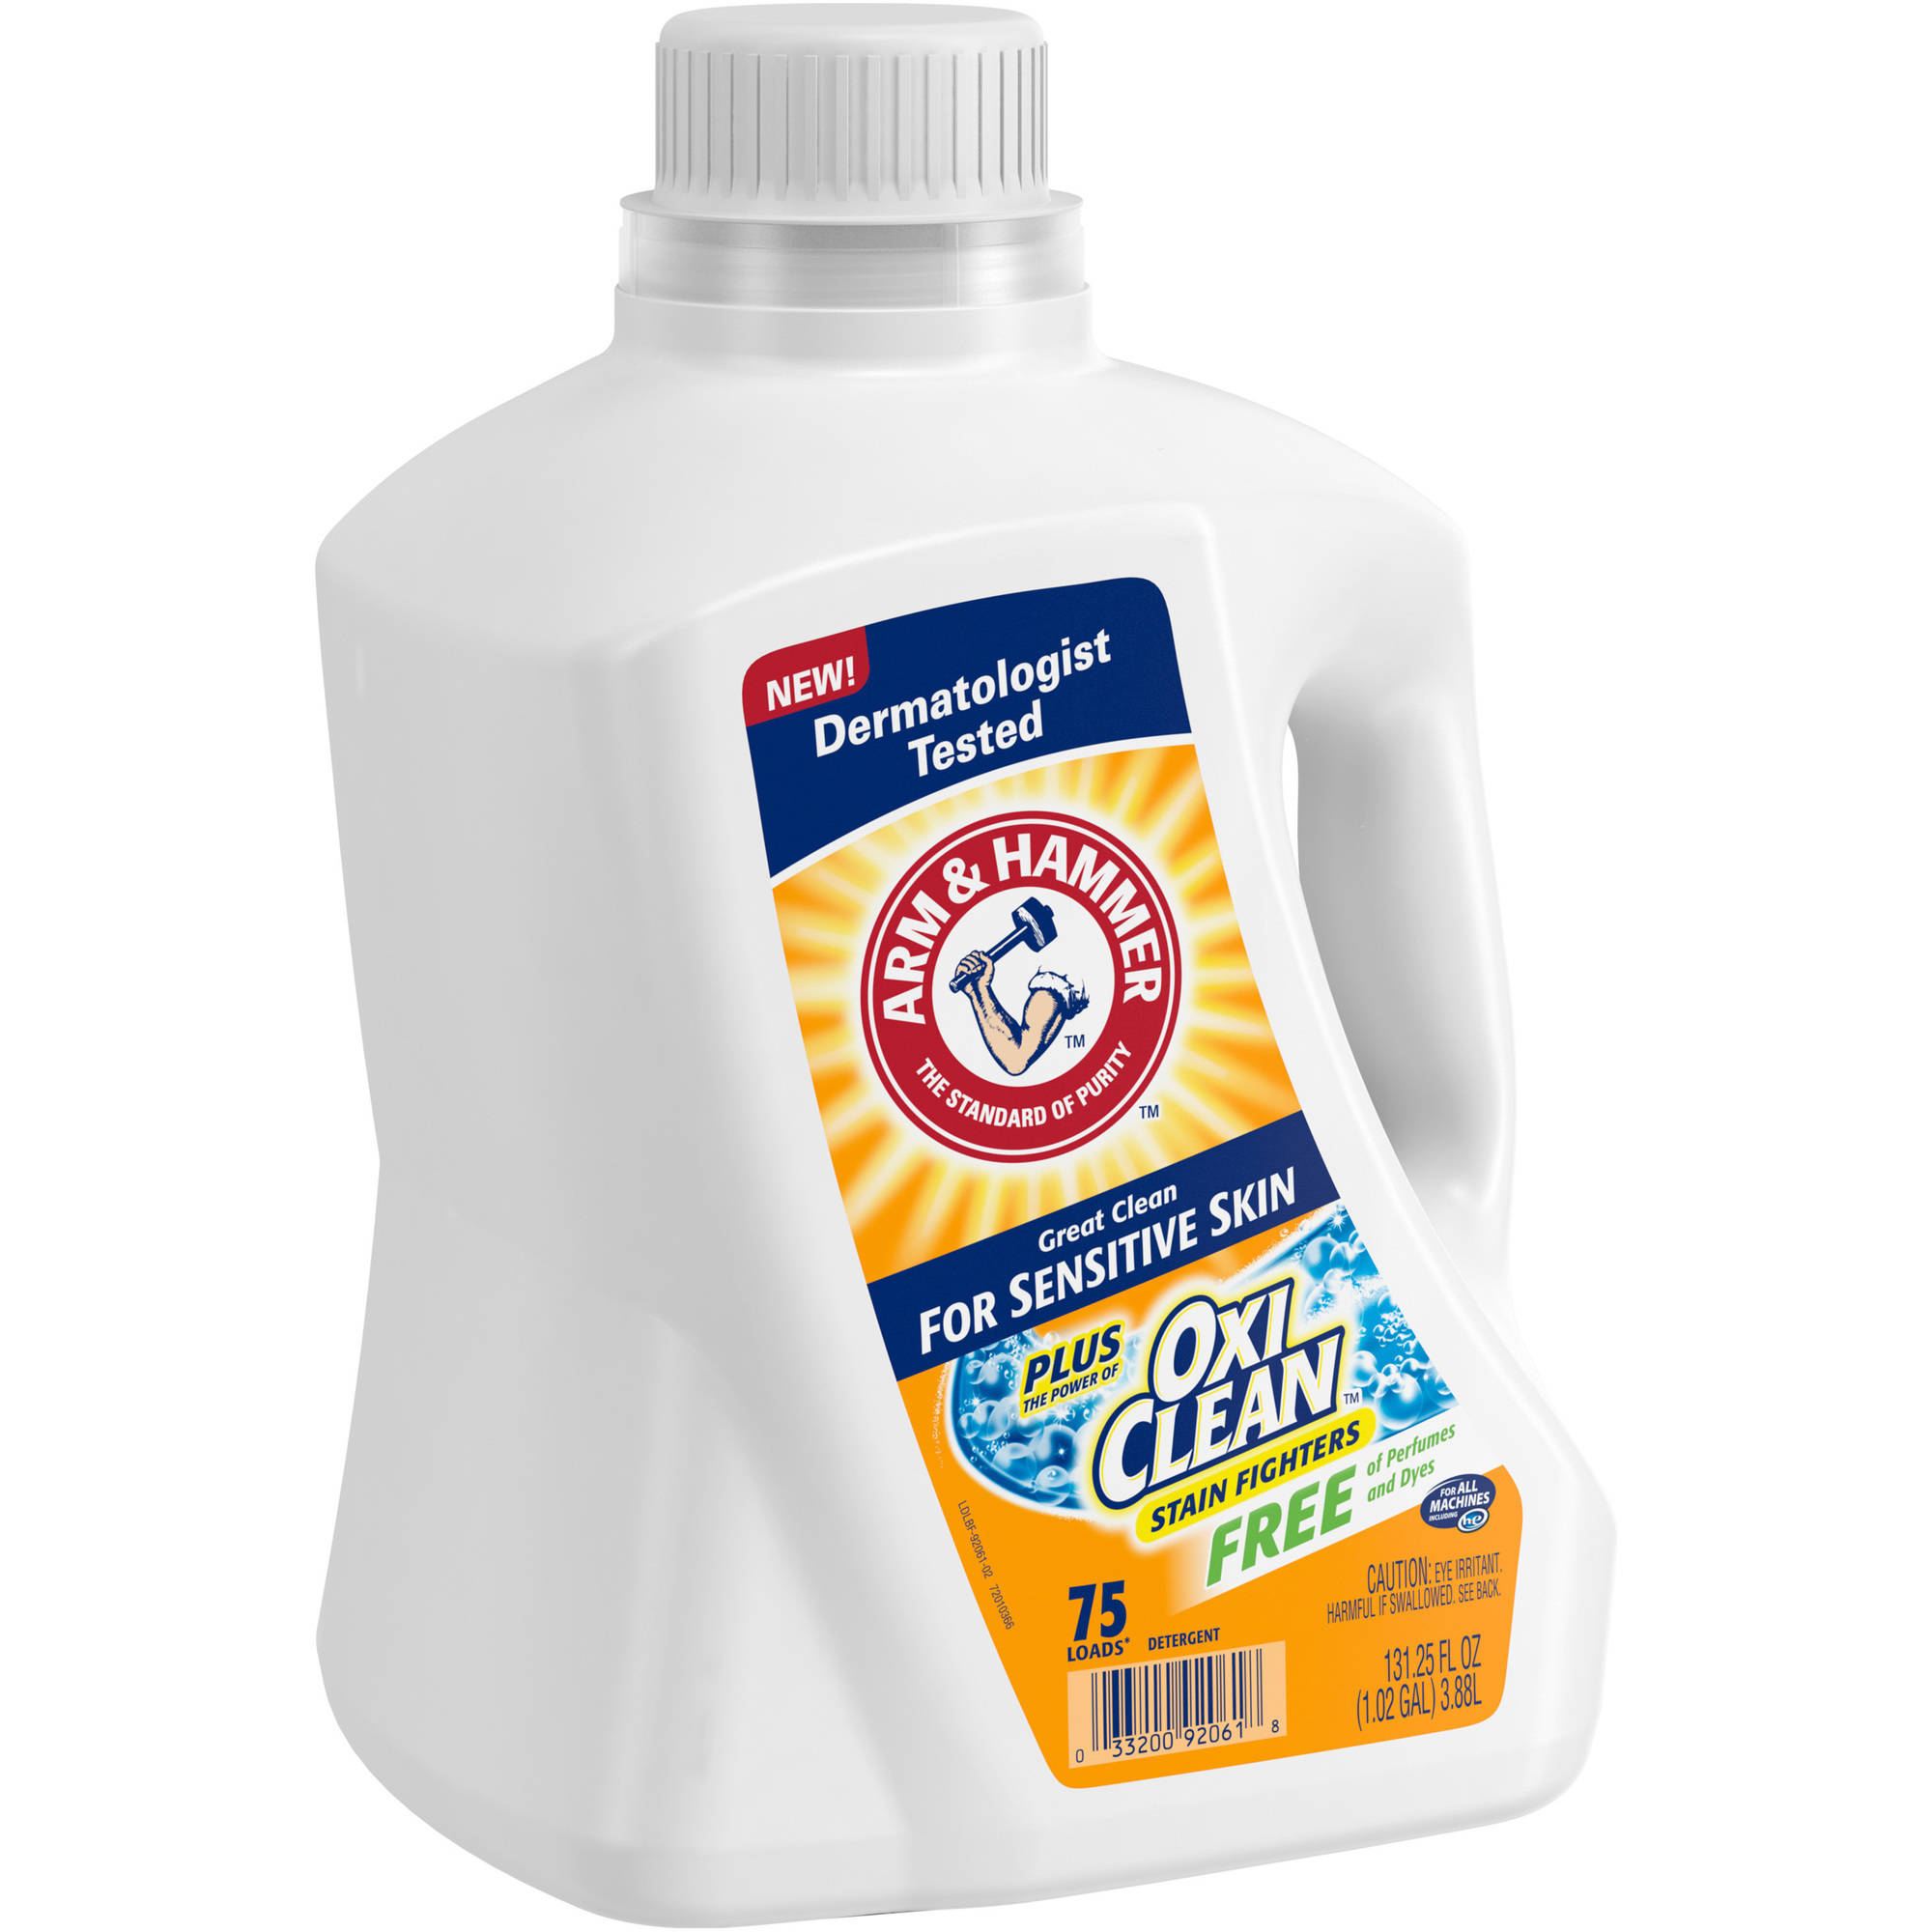 Arm & Hammer Sensitive Skin Plus OxiClean Liquid Laundry Detergent, 131.25 fl oz